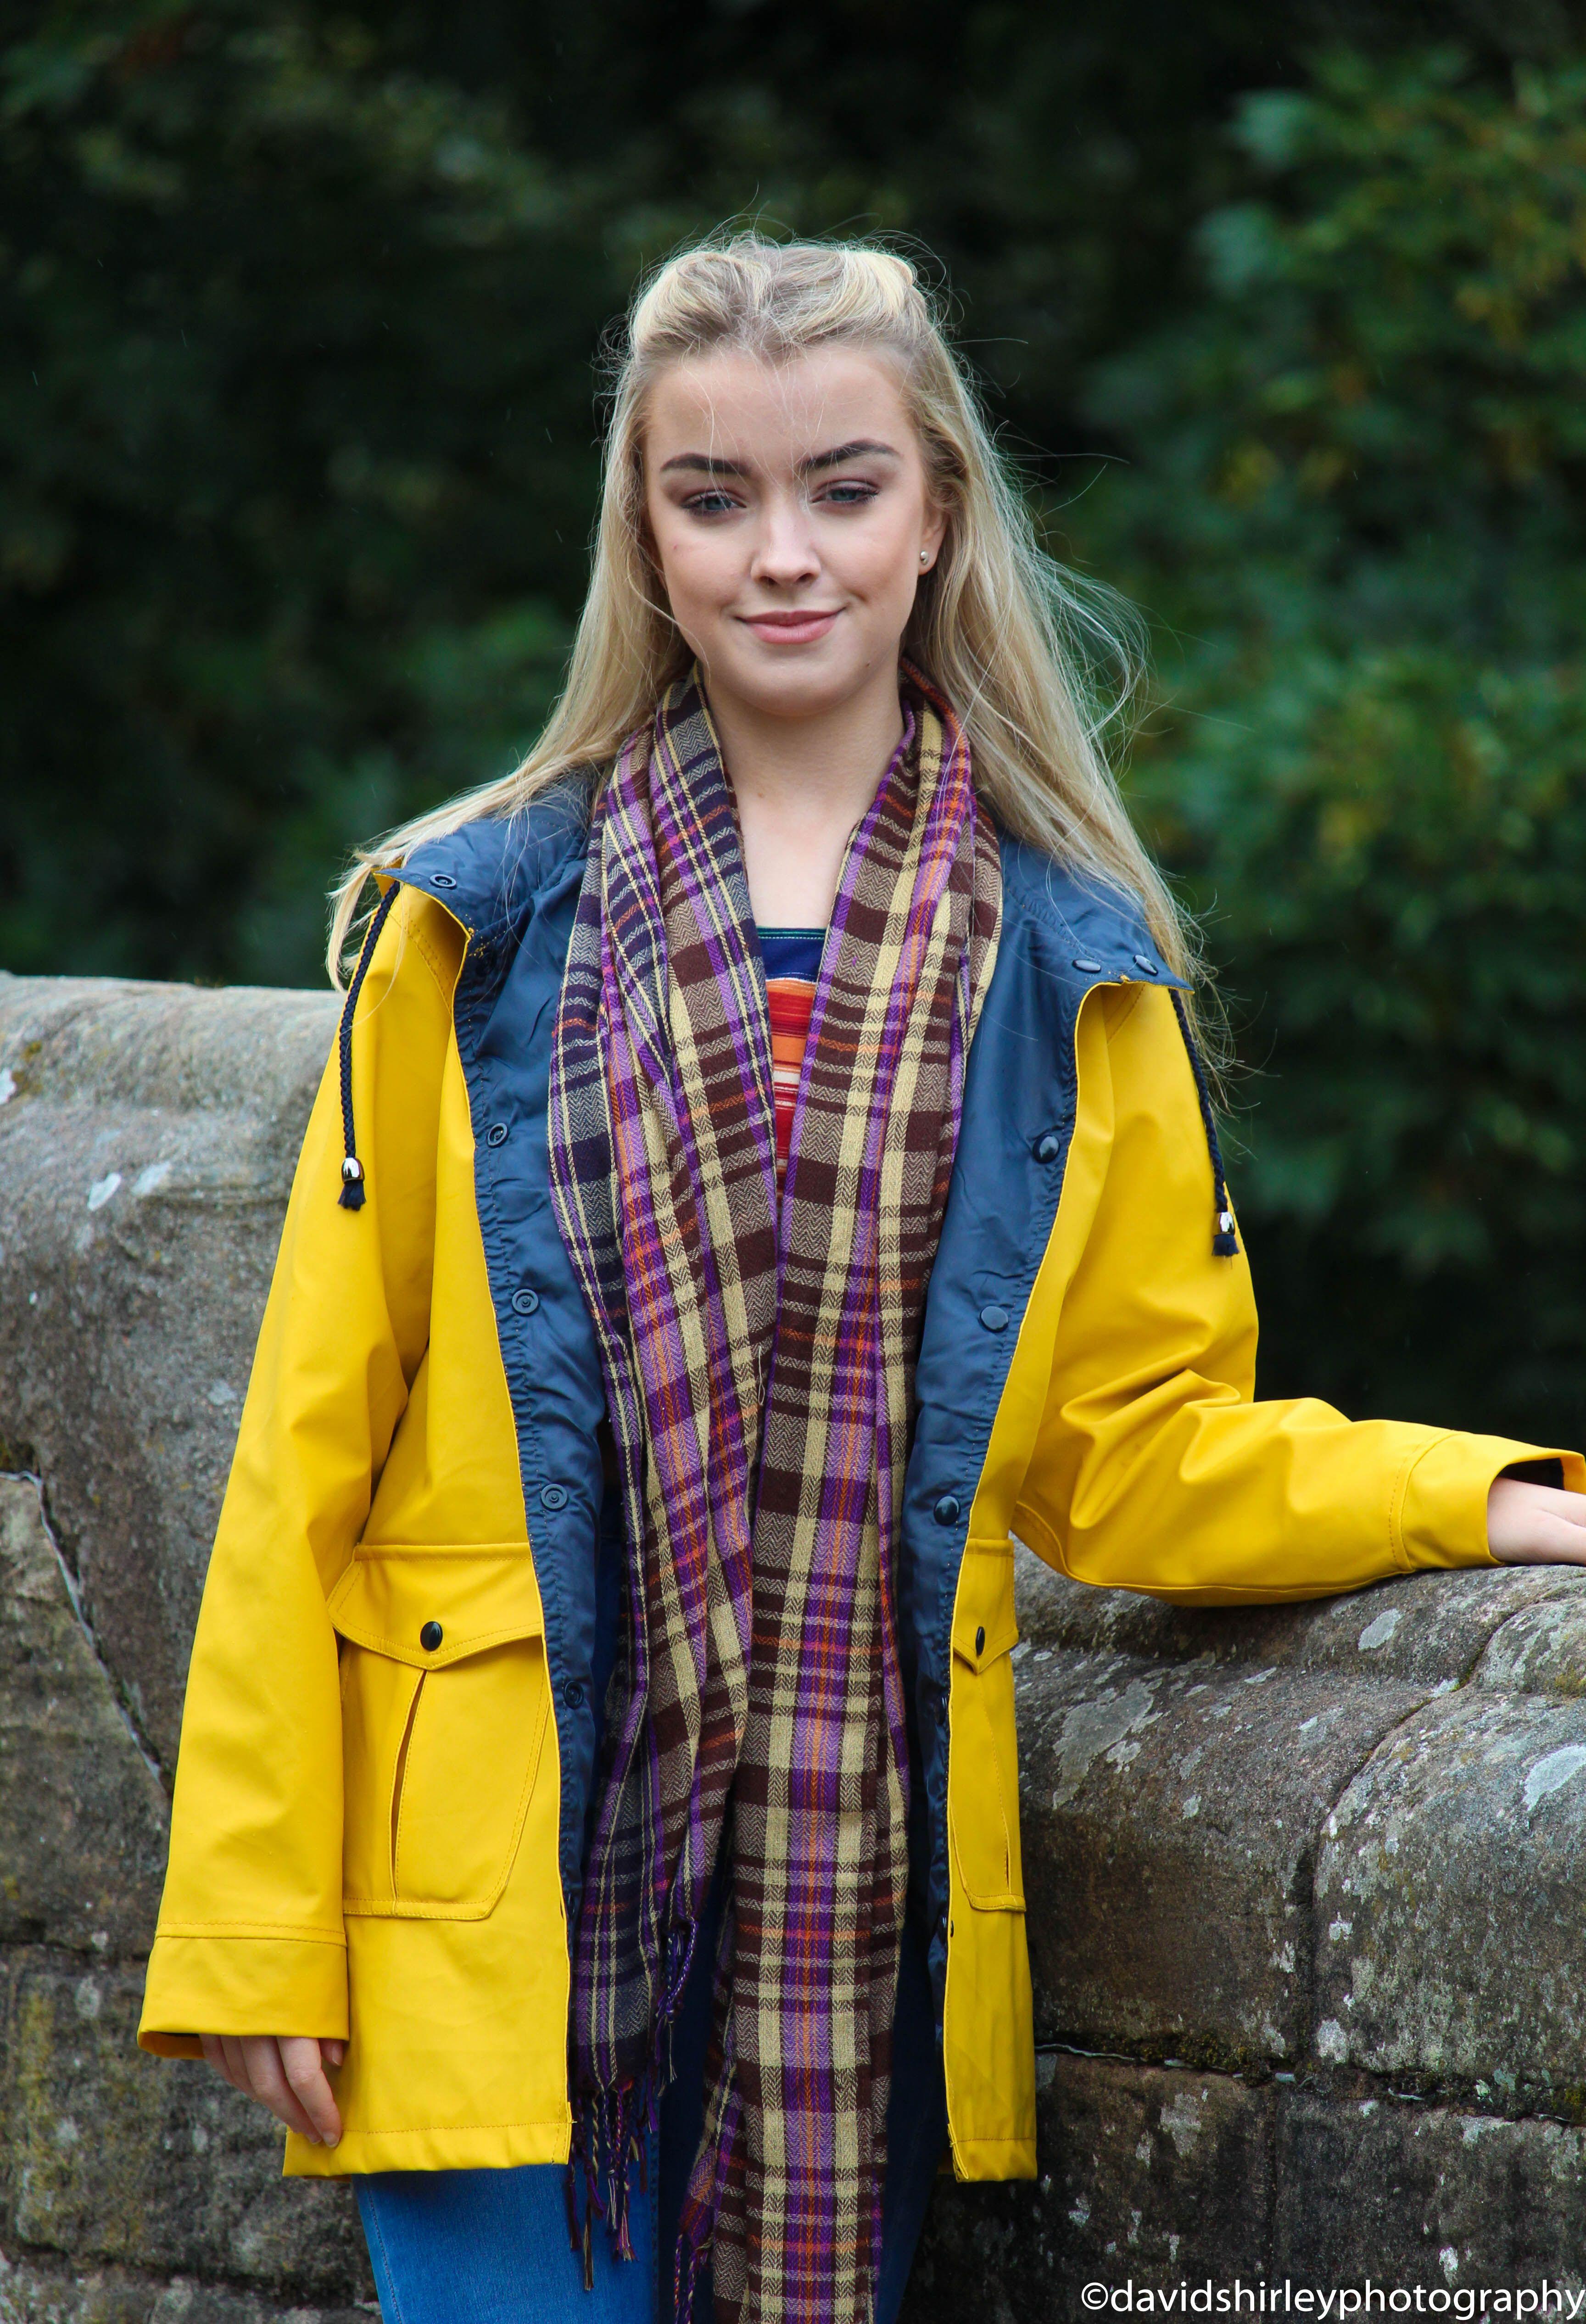 Pin Jan Sandberg Sade Yellow Raincoat